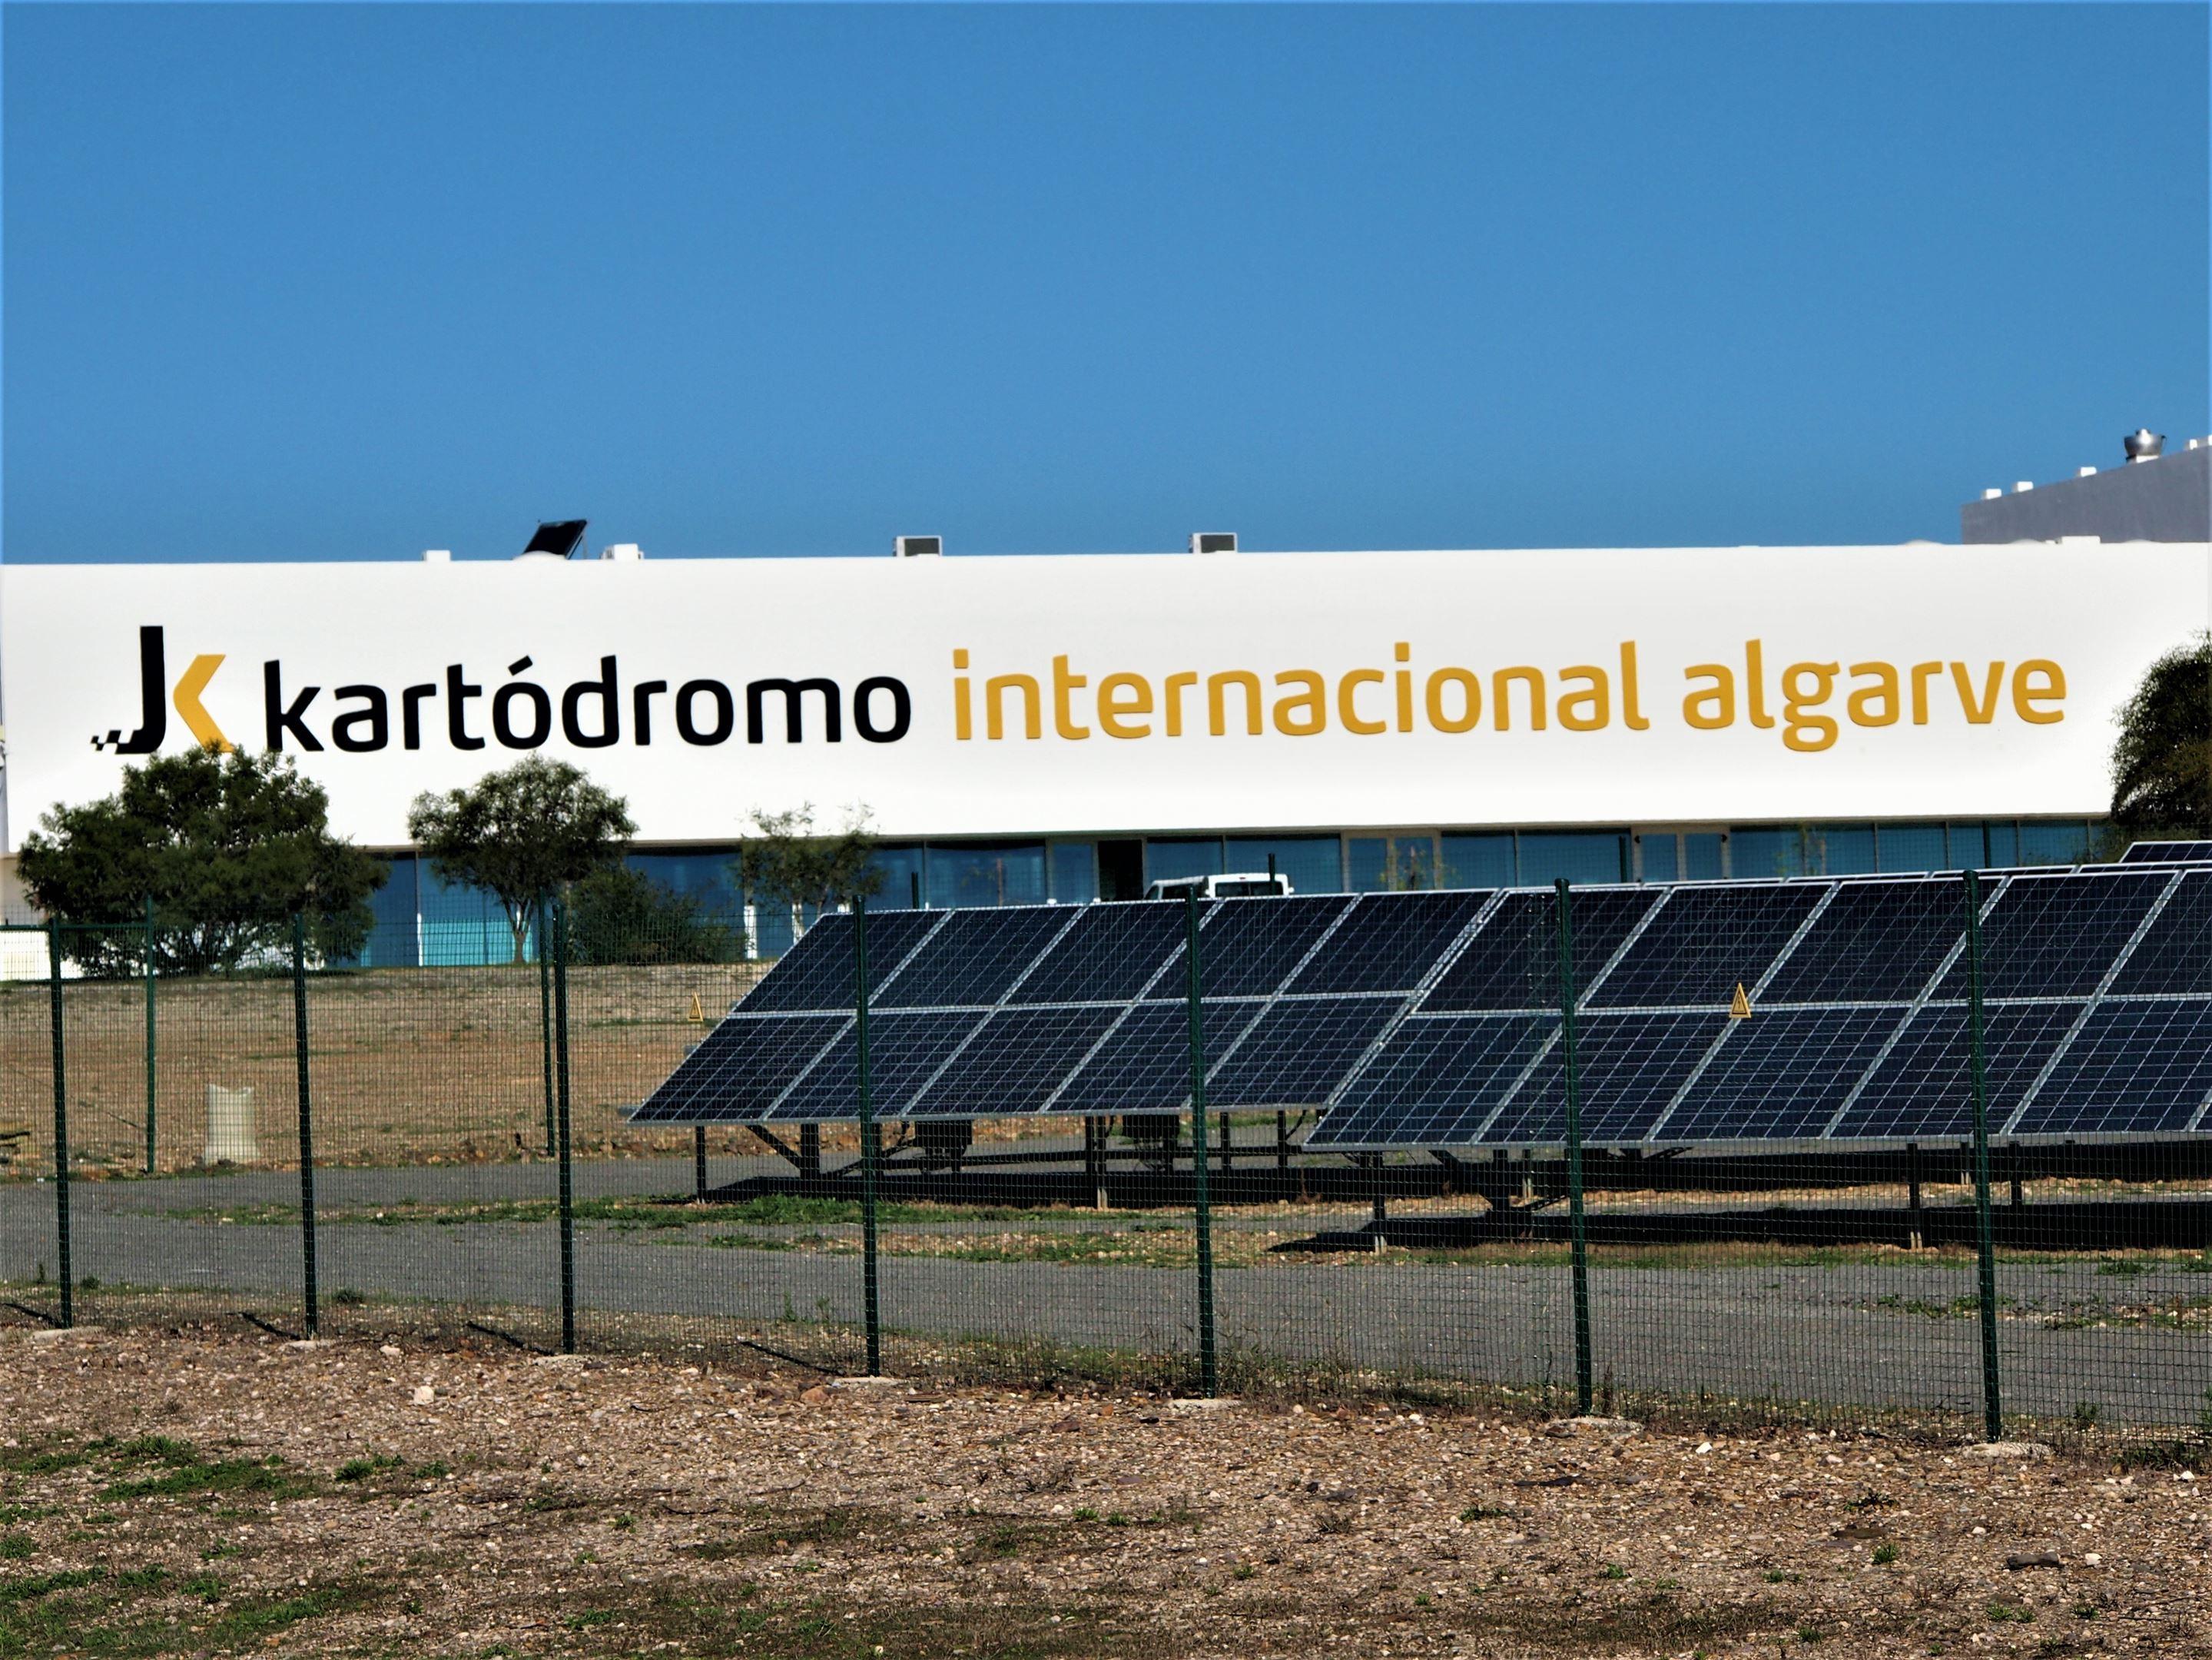 Kartódromo Internacional at Portimão, Algarve